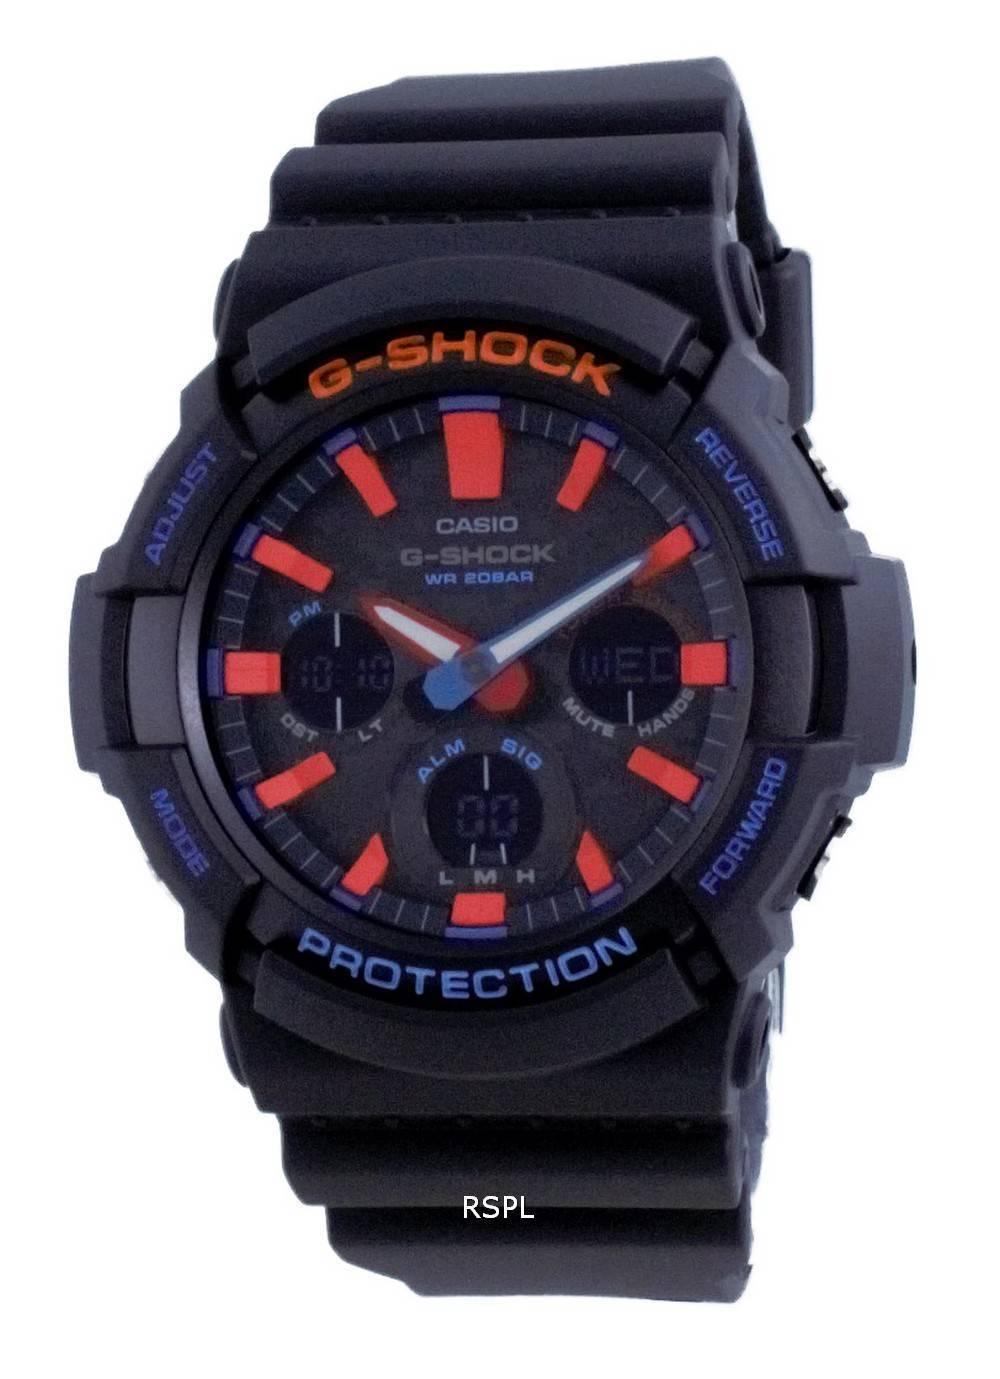 Casio G-Shock City analoginen digitaalinen kova aurinkosukeltajan Eco-Drive GAS-100CT-1A GAS100CT-1 200M miesten kello